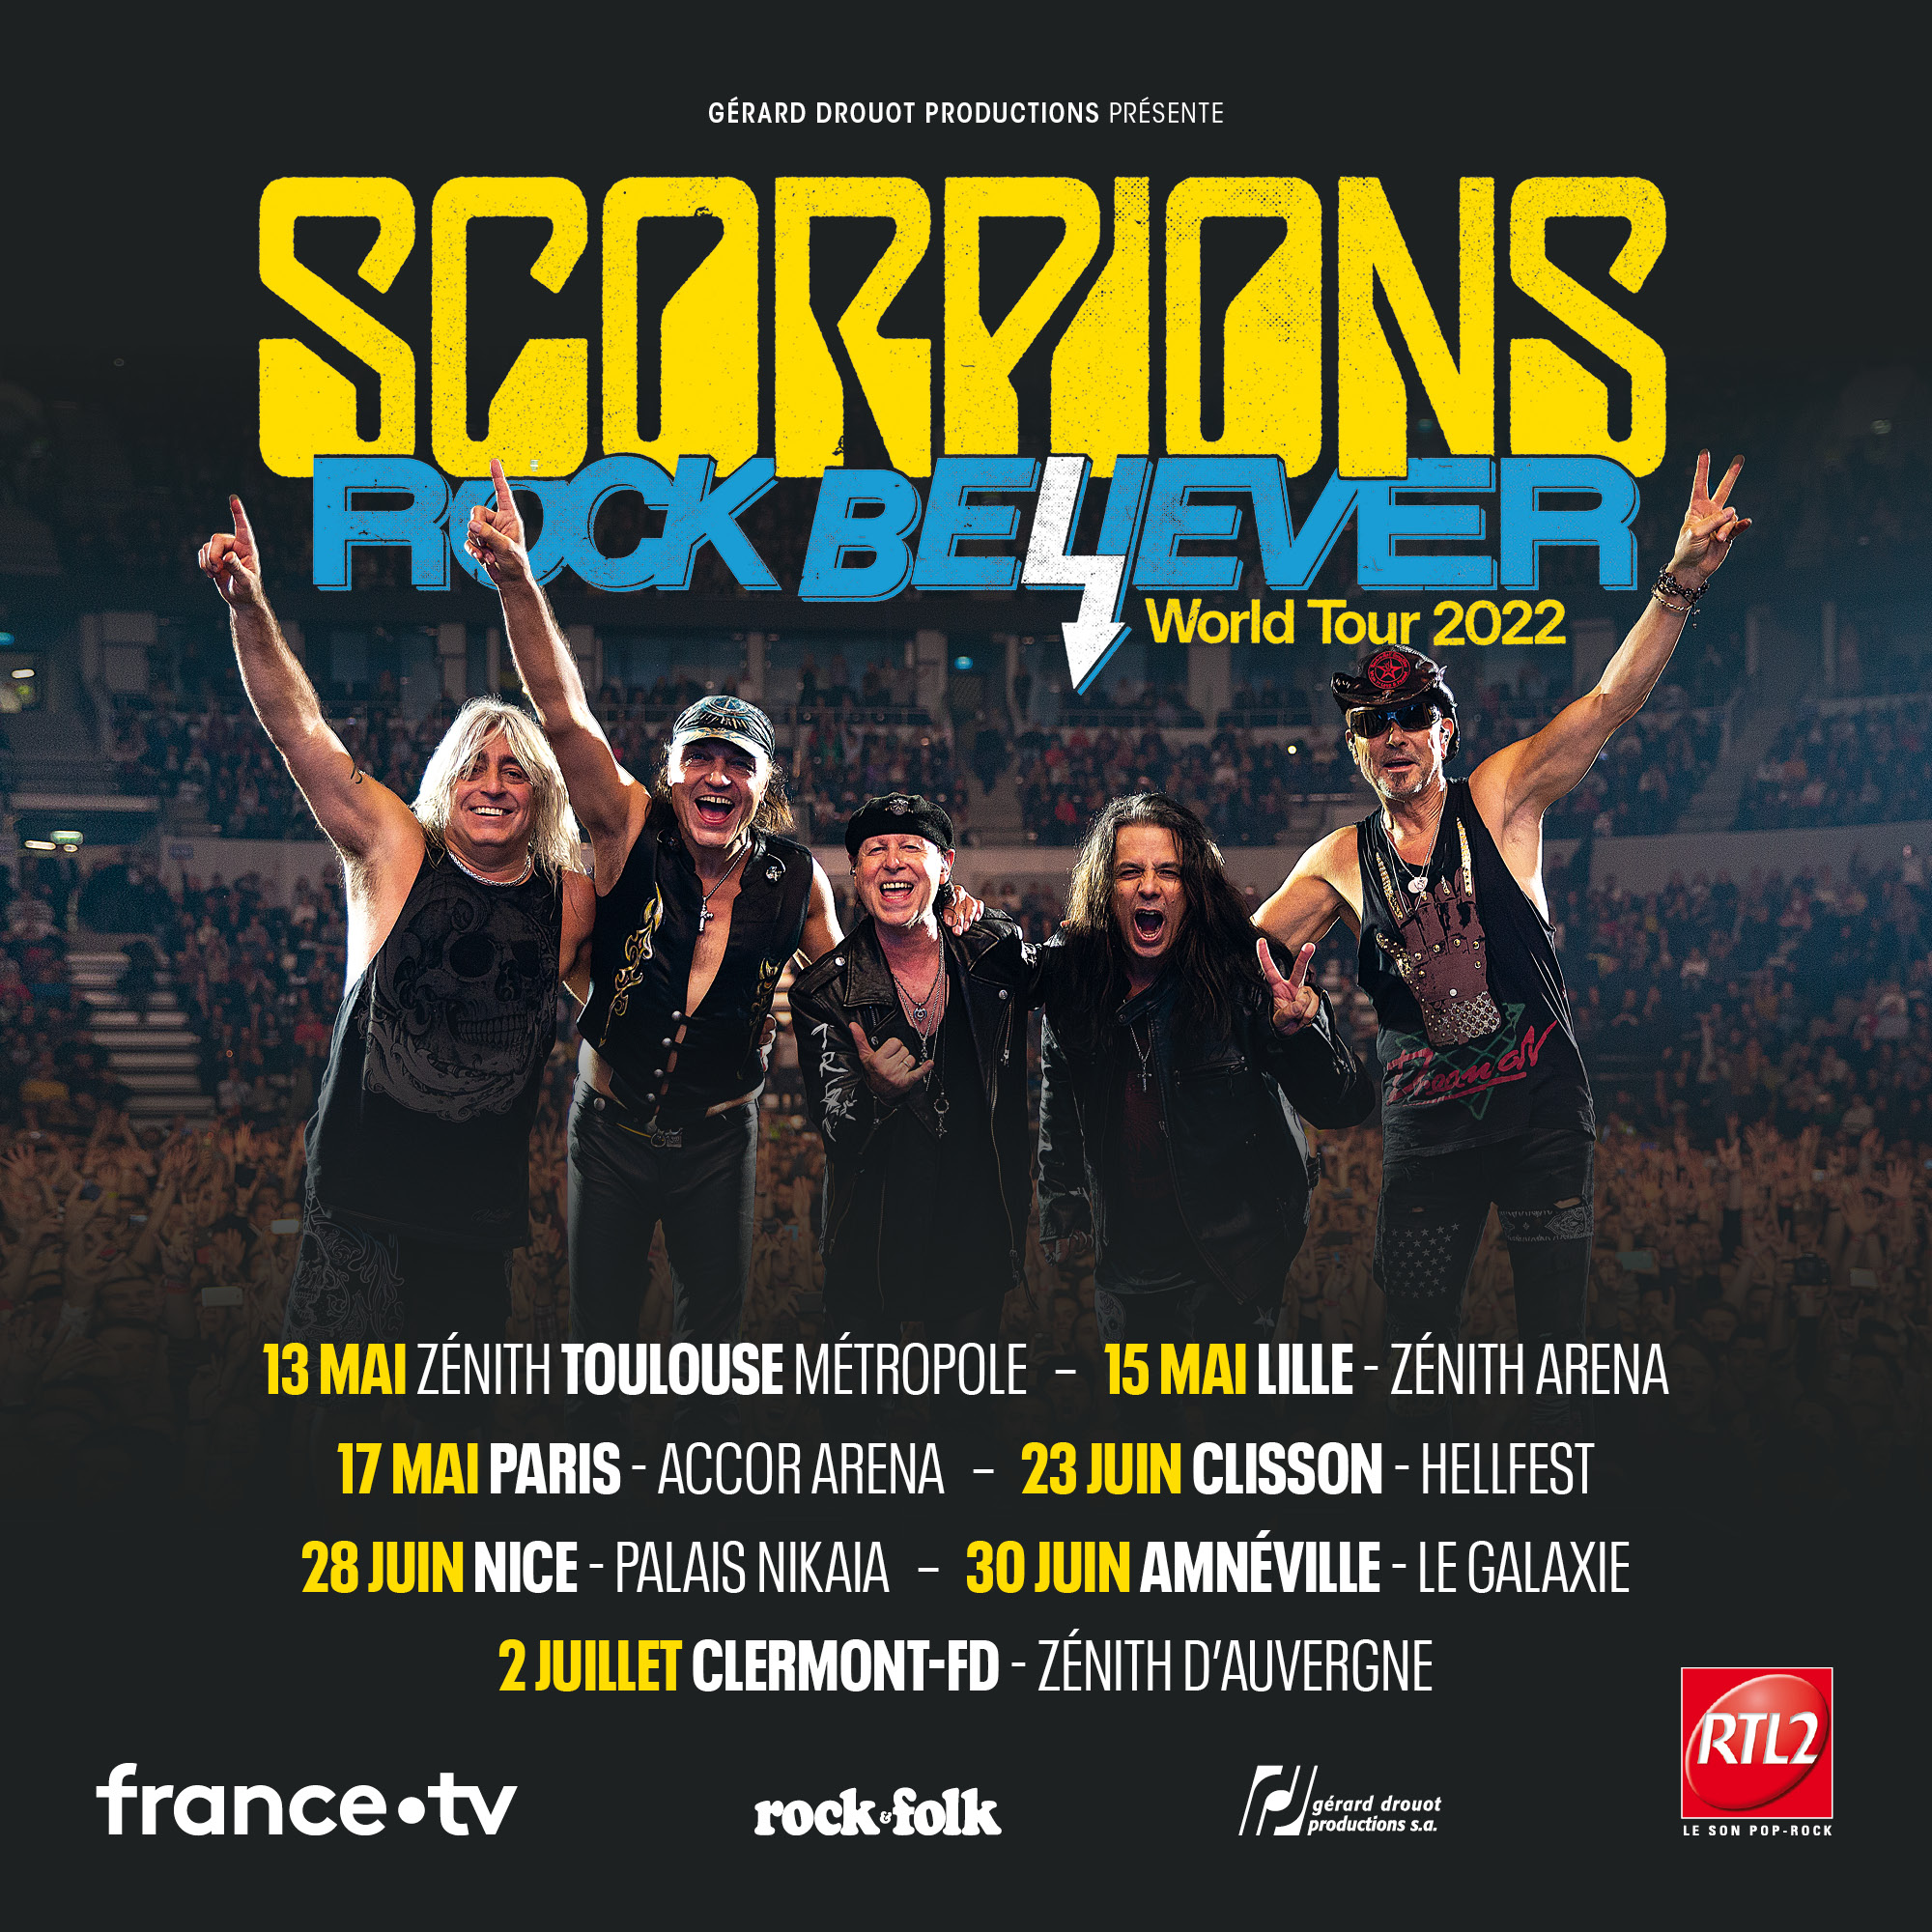 Billets Scorpions (Accor Arena - Paris)